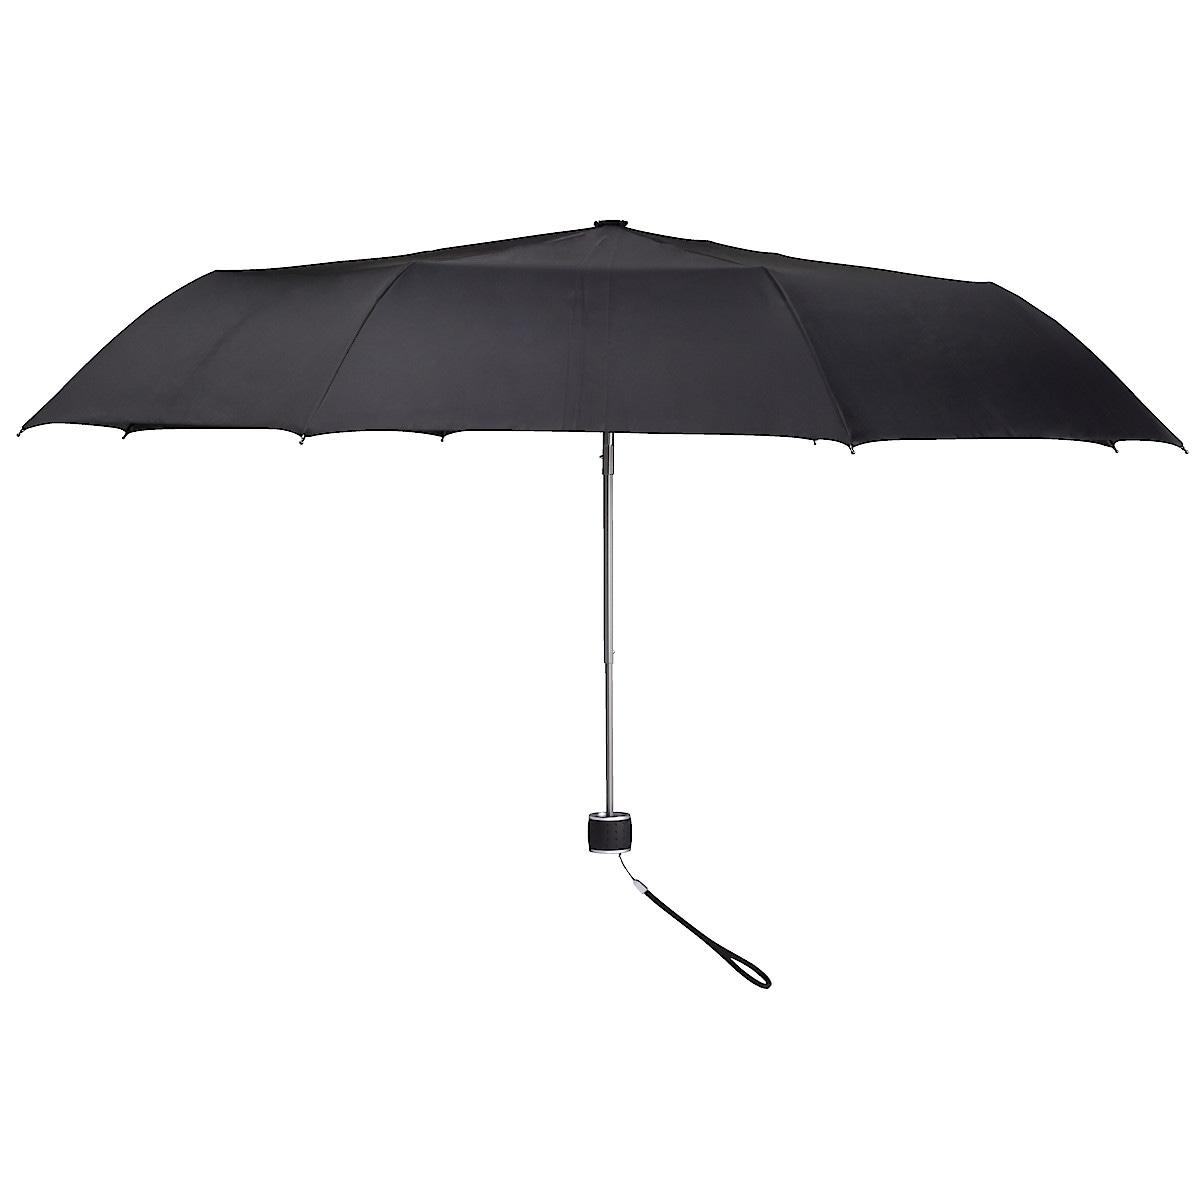 Paraply kompakt 103 cm